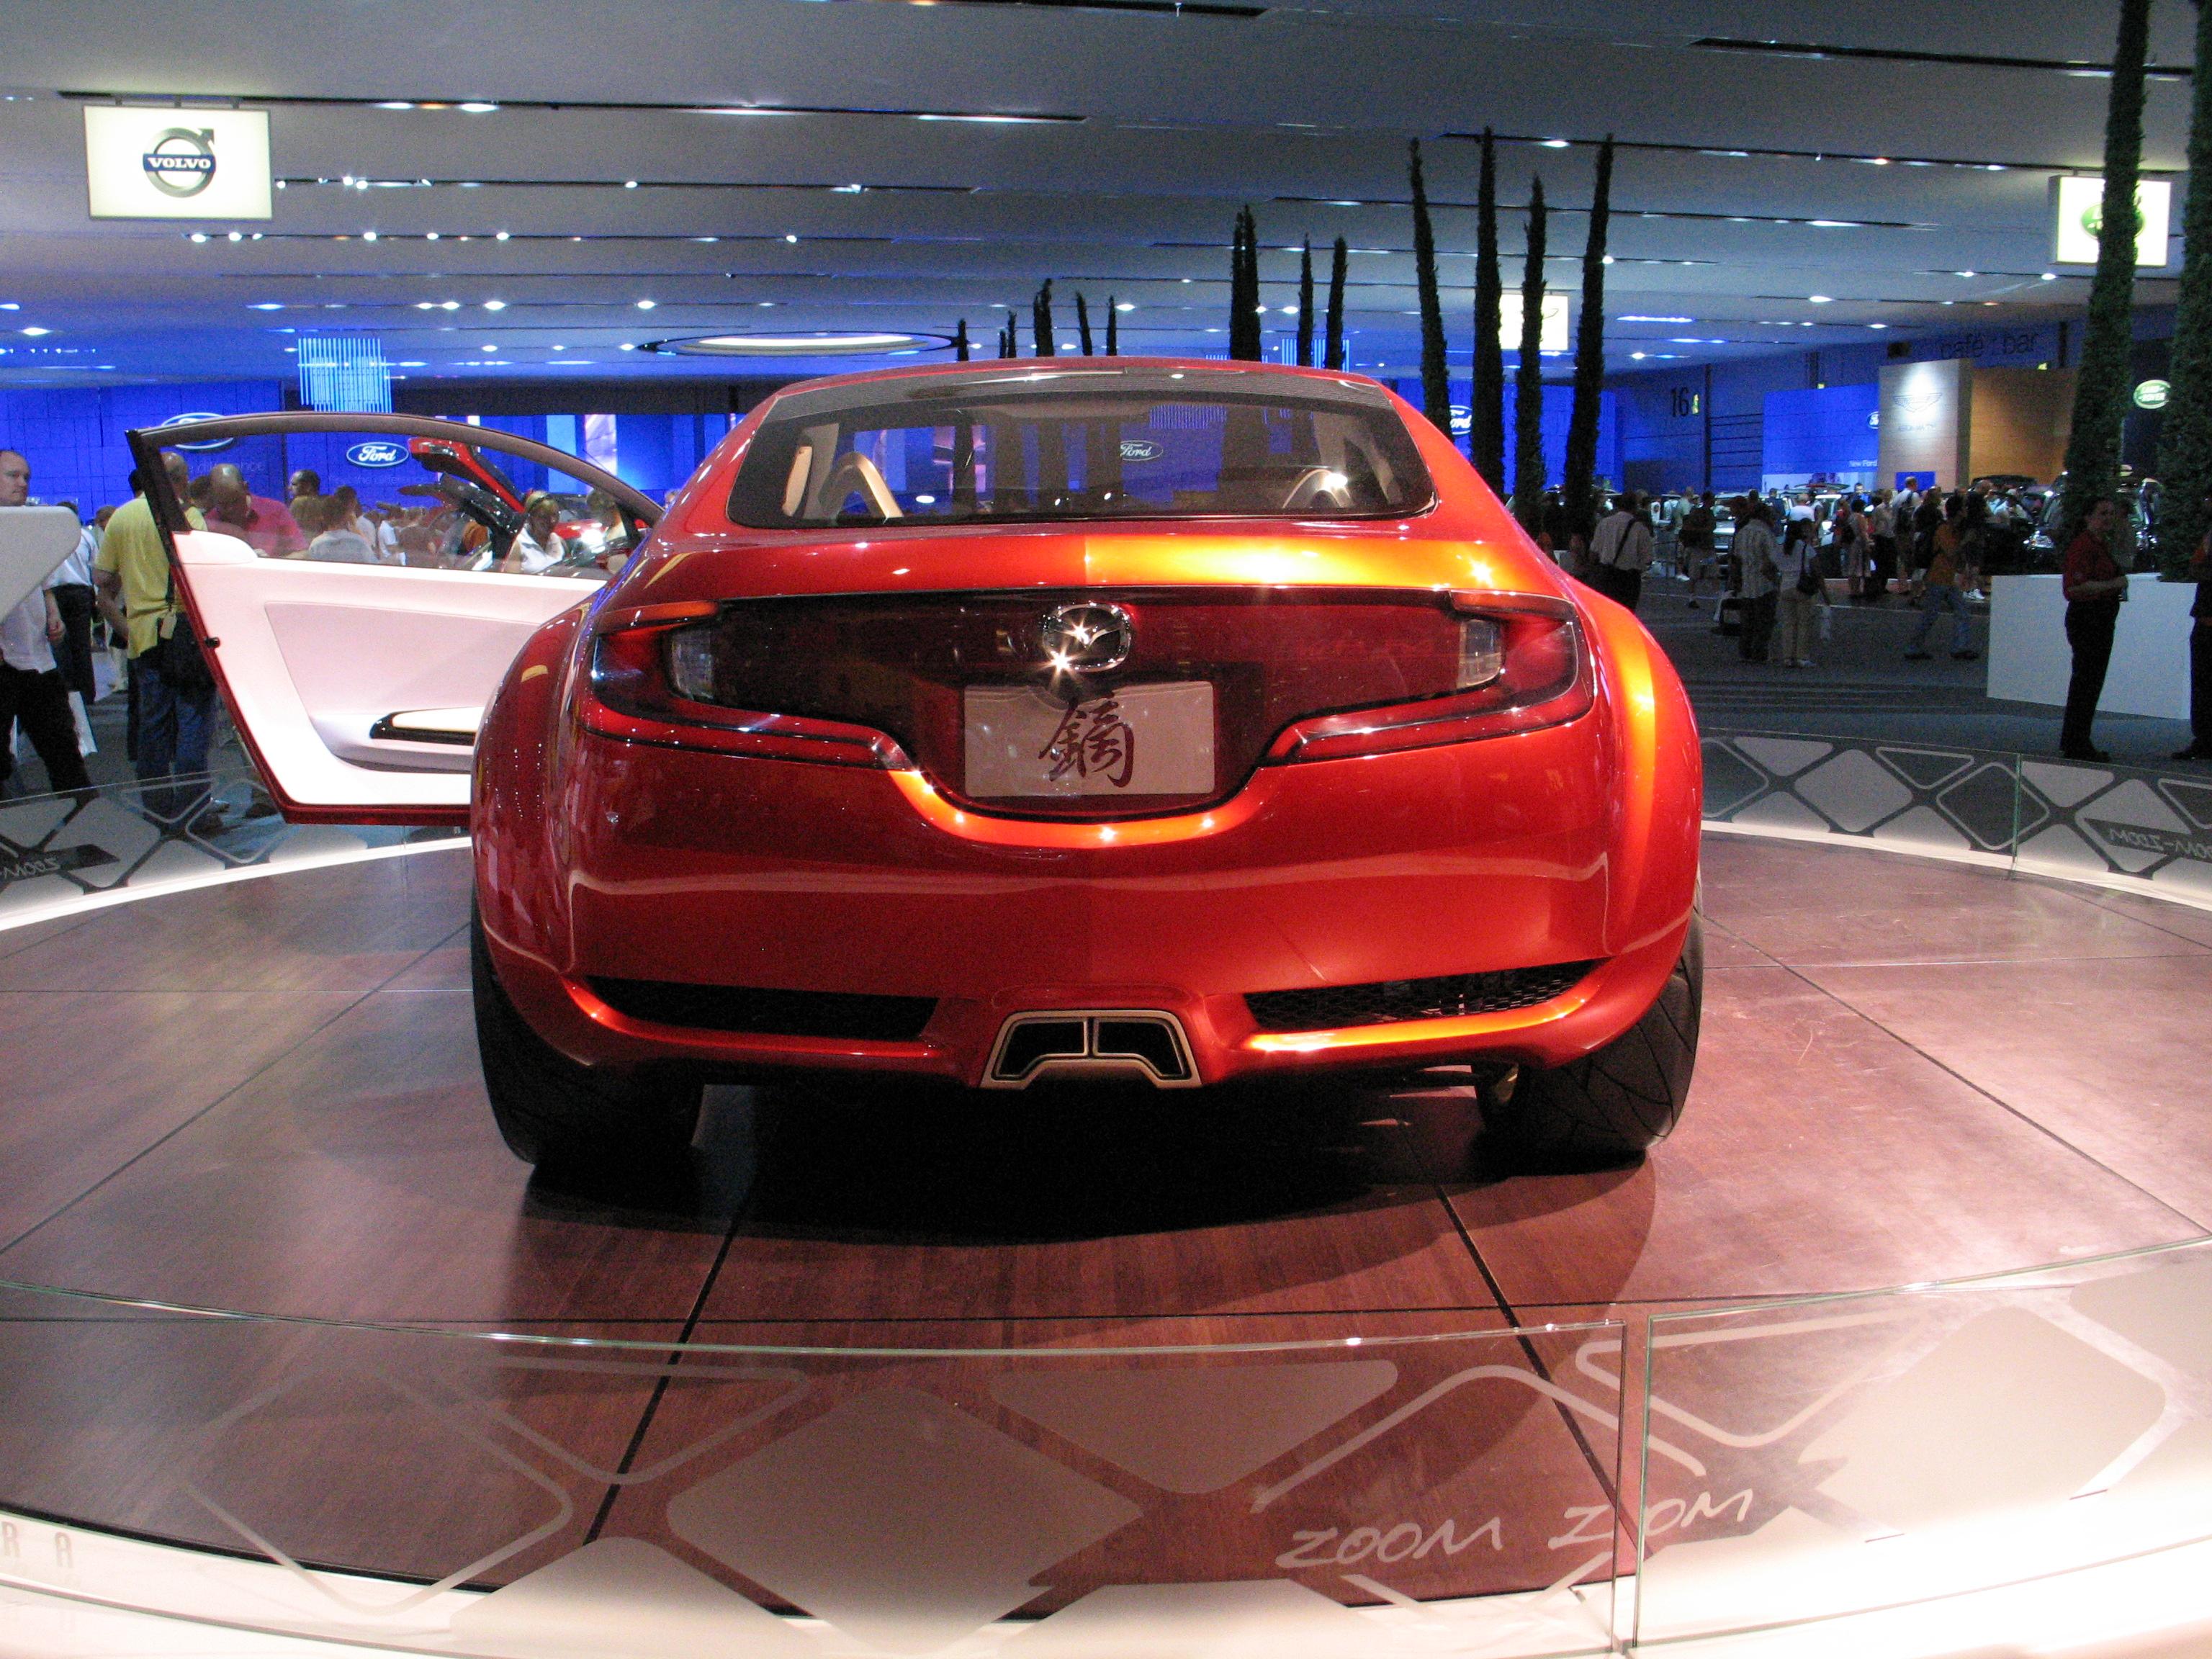 https://upload.wikimedia.org/wikipedia/commons/4/4d/Mazda_Kabura_Concept_-_002_-_Flickr_-_cosmic_spanner.jpg